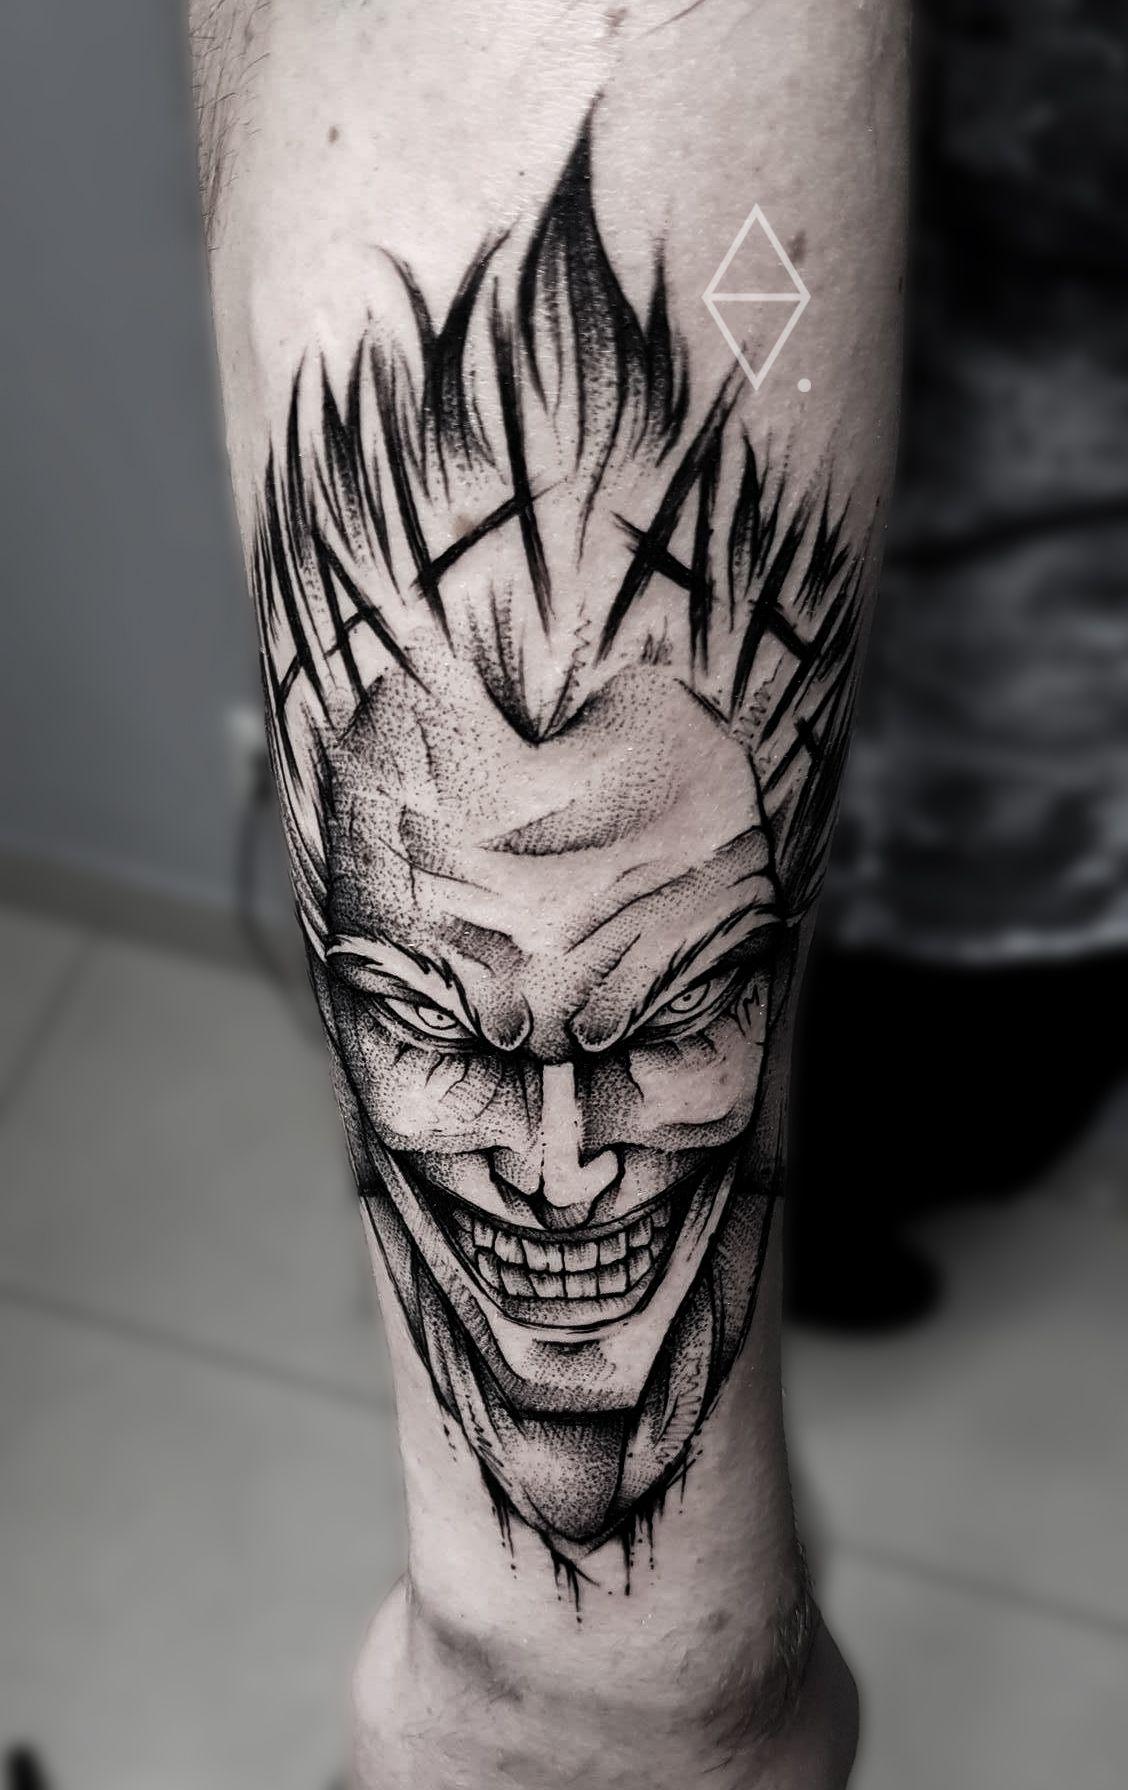 Joker Ha Ha Ha Tattoo: Joker Tattoo By Szymon Olech (com Imagens)